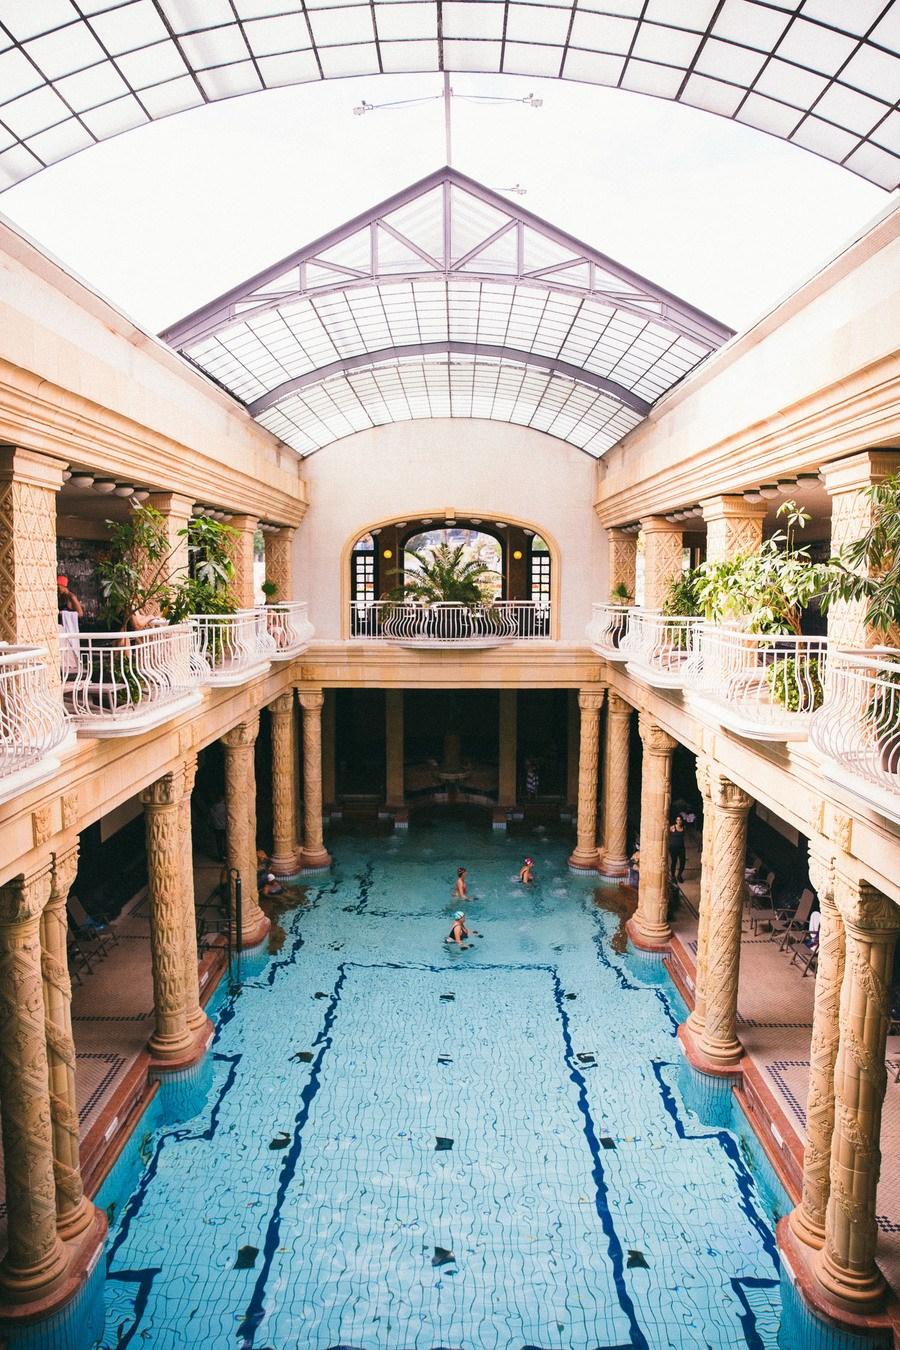 Les bains de Gellért de haut